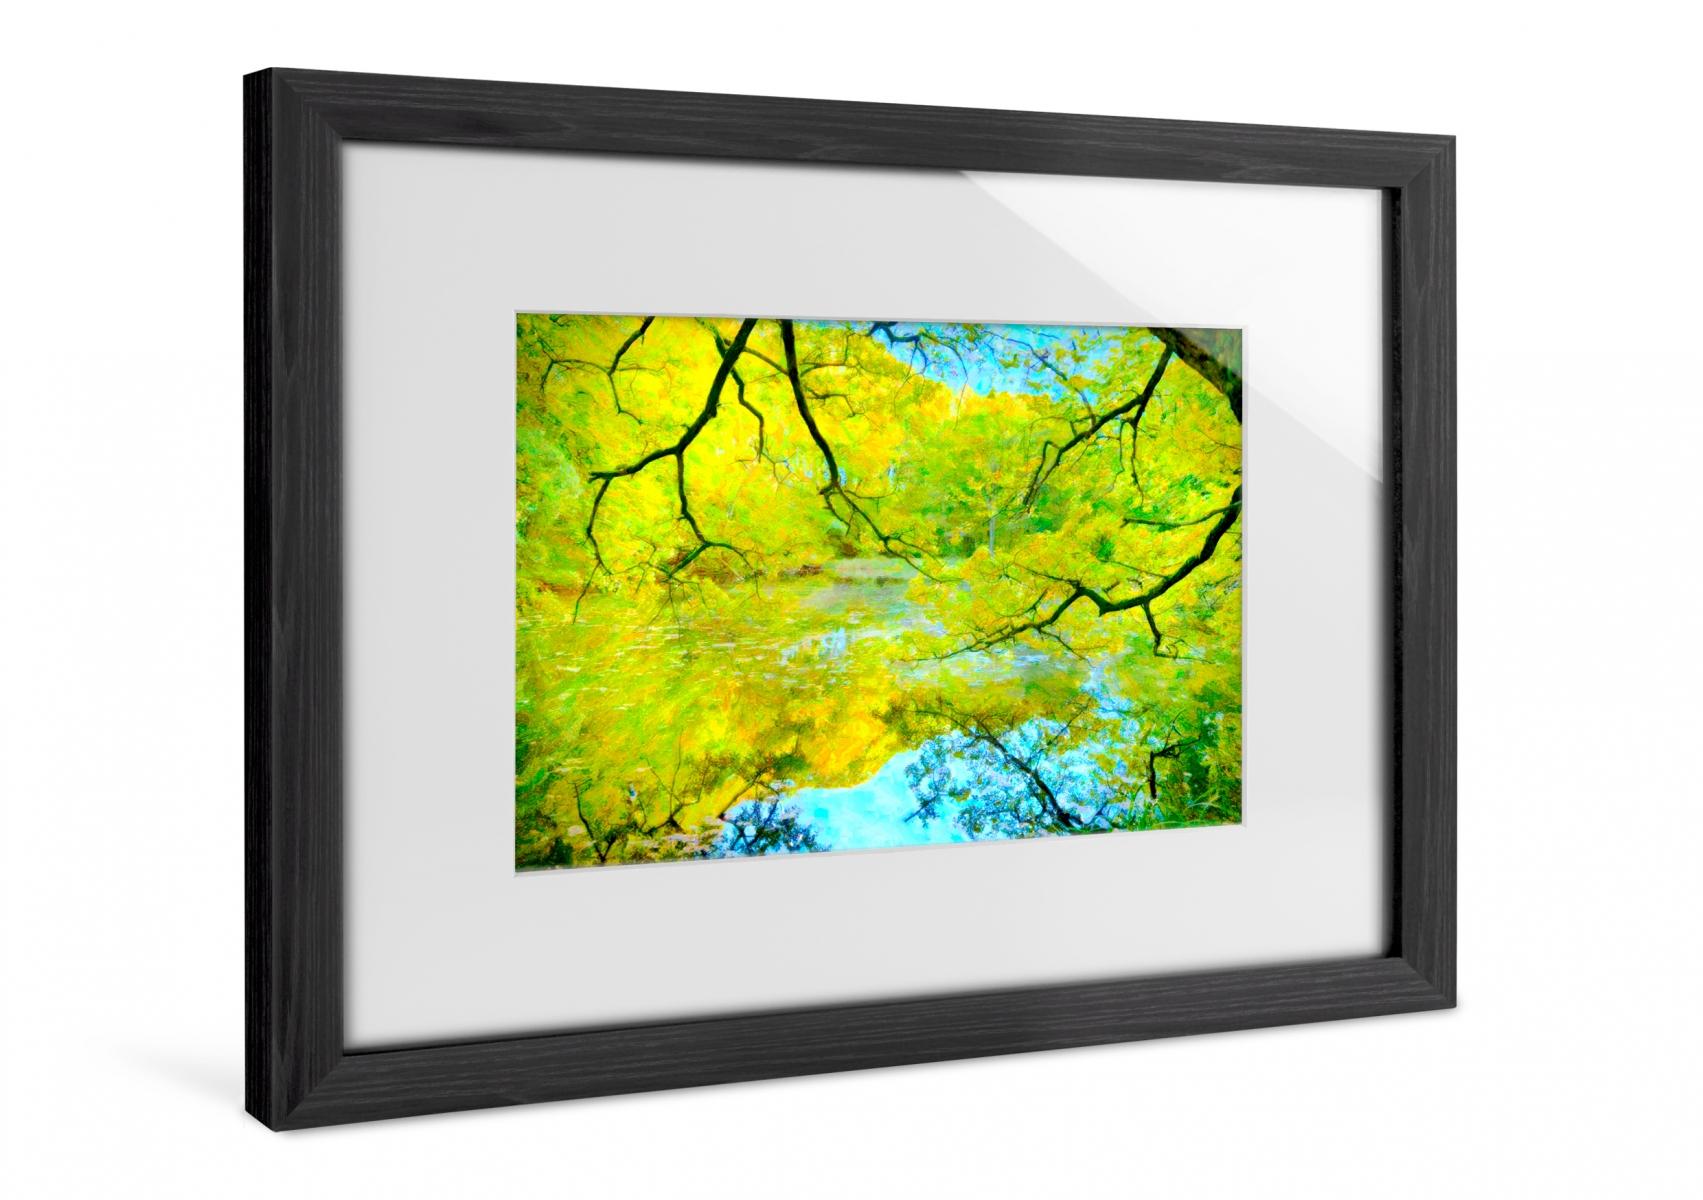 Christensen-photoart-FINE-ART-PRINT-K039-Christensen-photoart